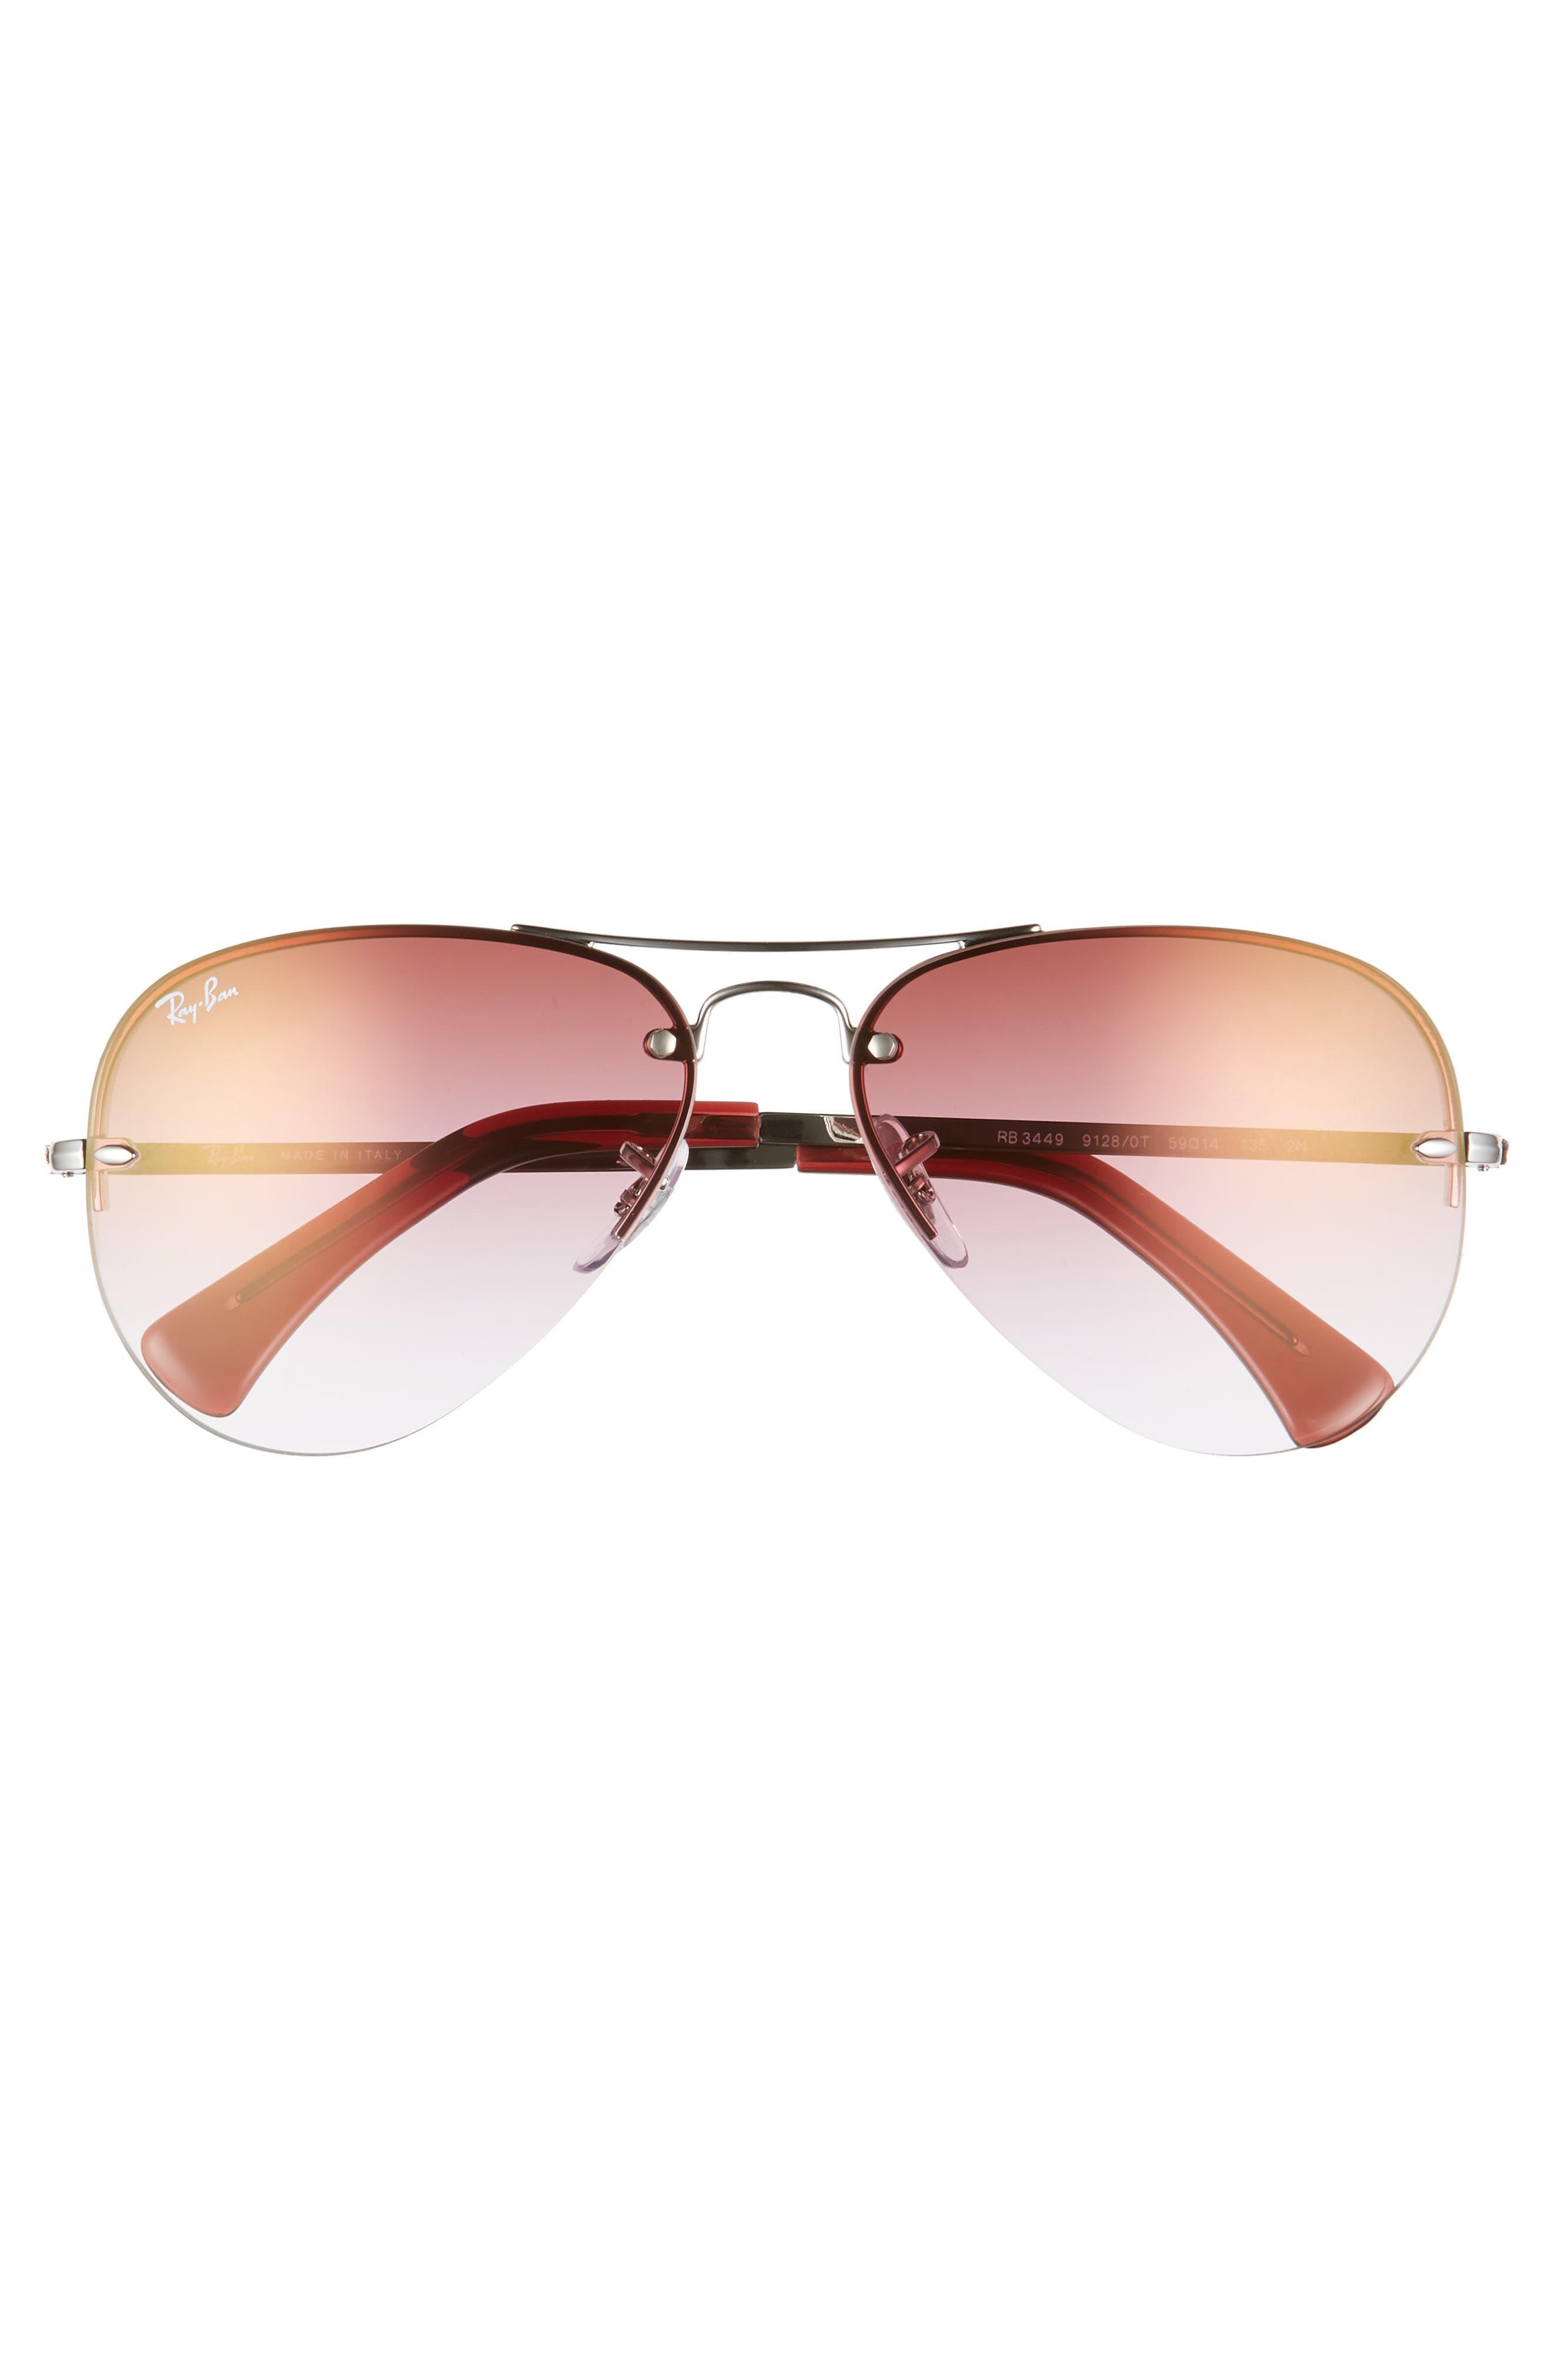 Highstreet 59mm Semi Rimless Aviator Sunglasses,                             Alternate thumbnail 3, color,                             SILVER/ BORDEAUX GRADIENT